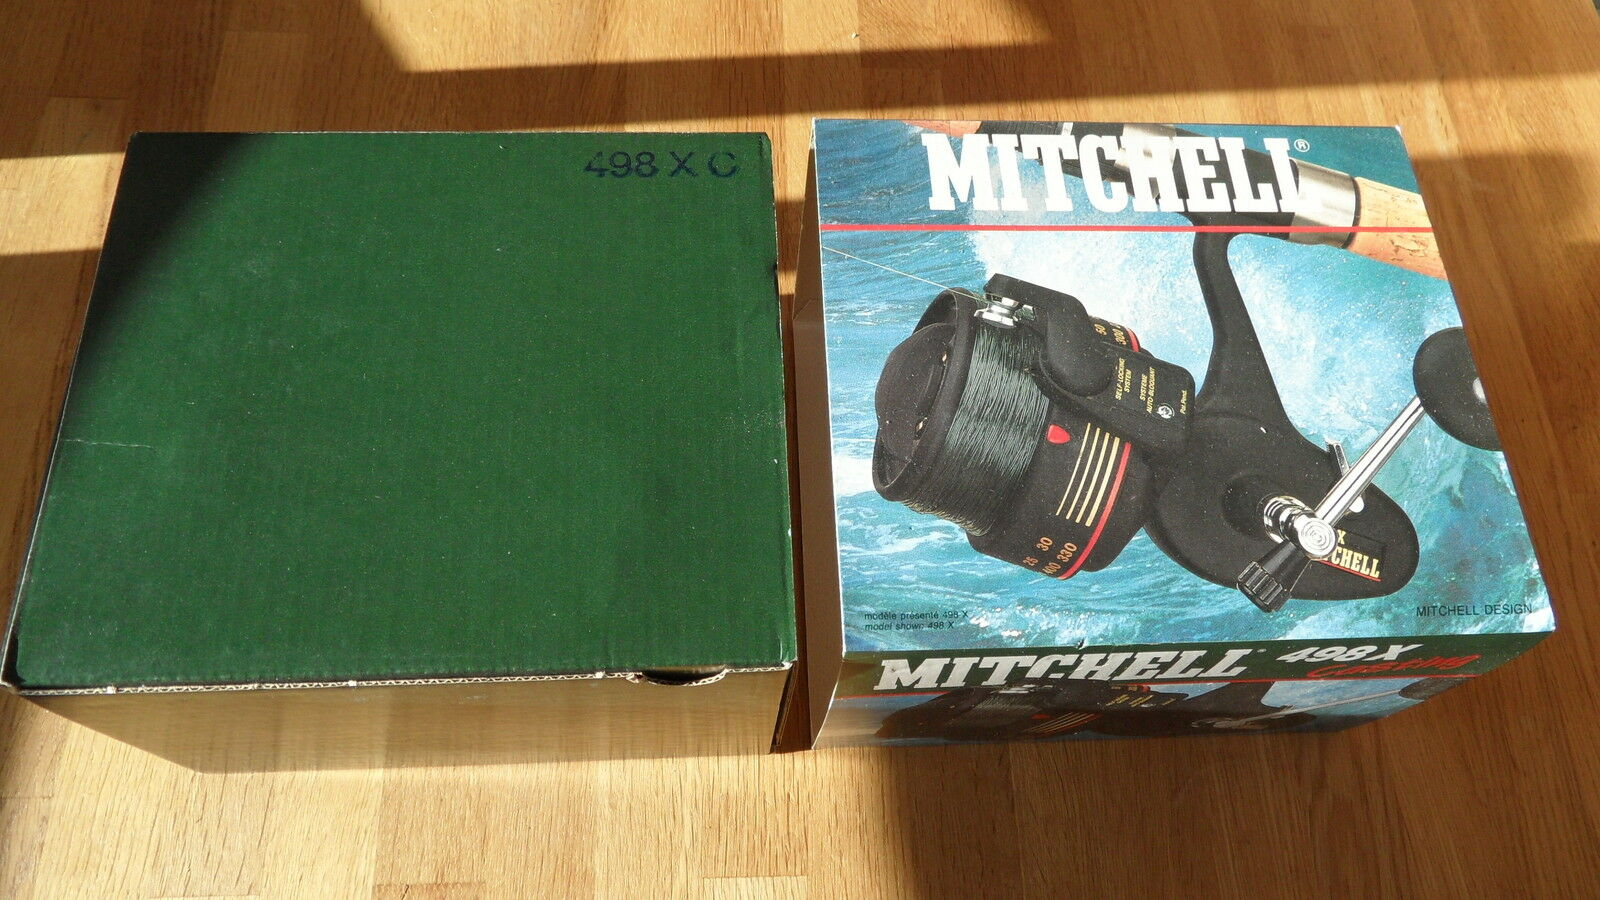 Mitchell 498x Casting zeewerpmolen Sea reel Peché moulinet